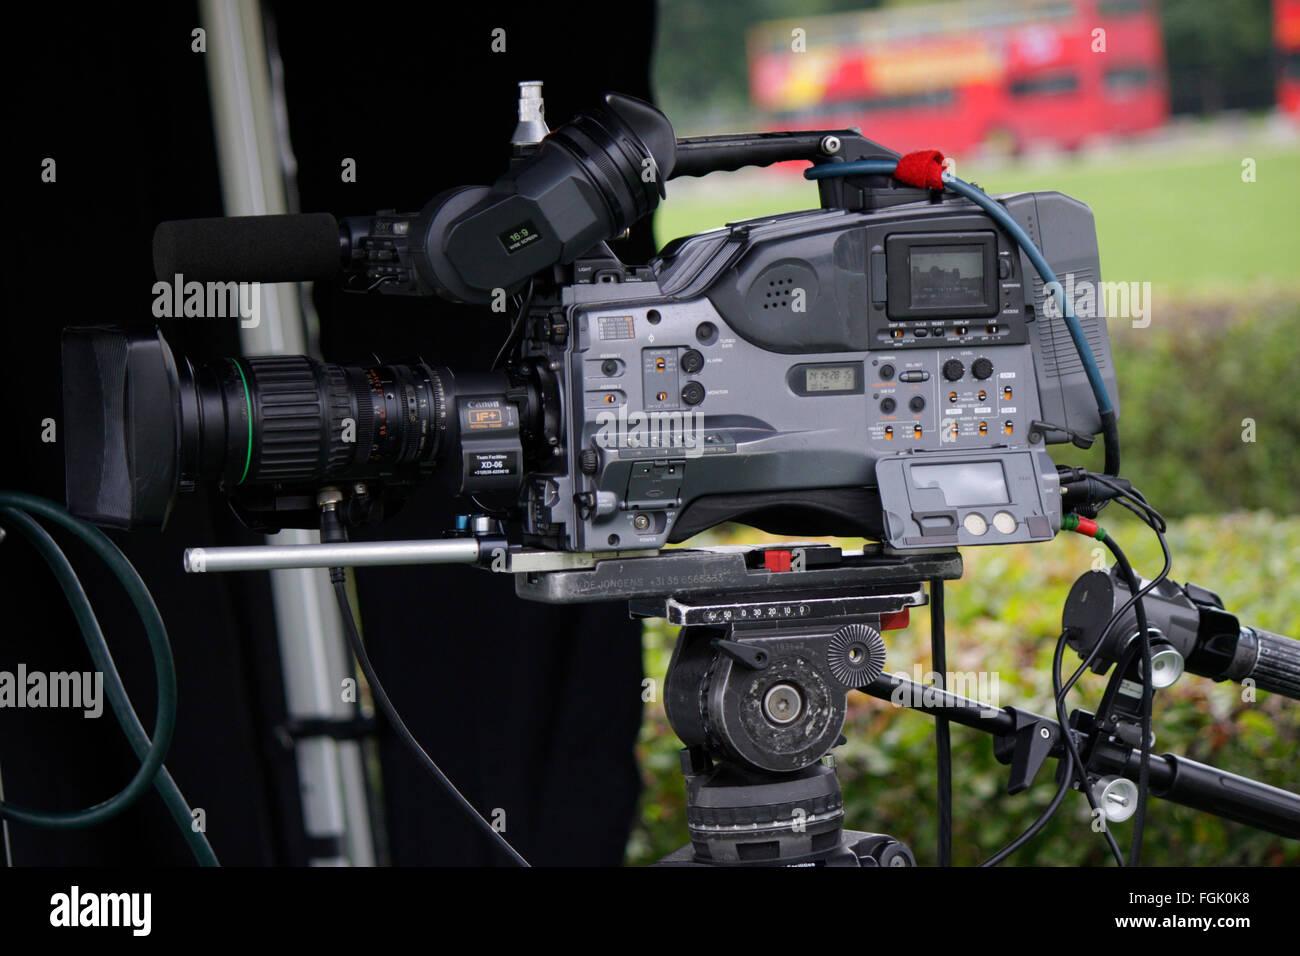 mit Fernsehkamera, Berlin. Stockbild